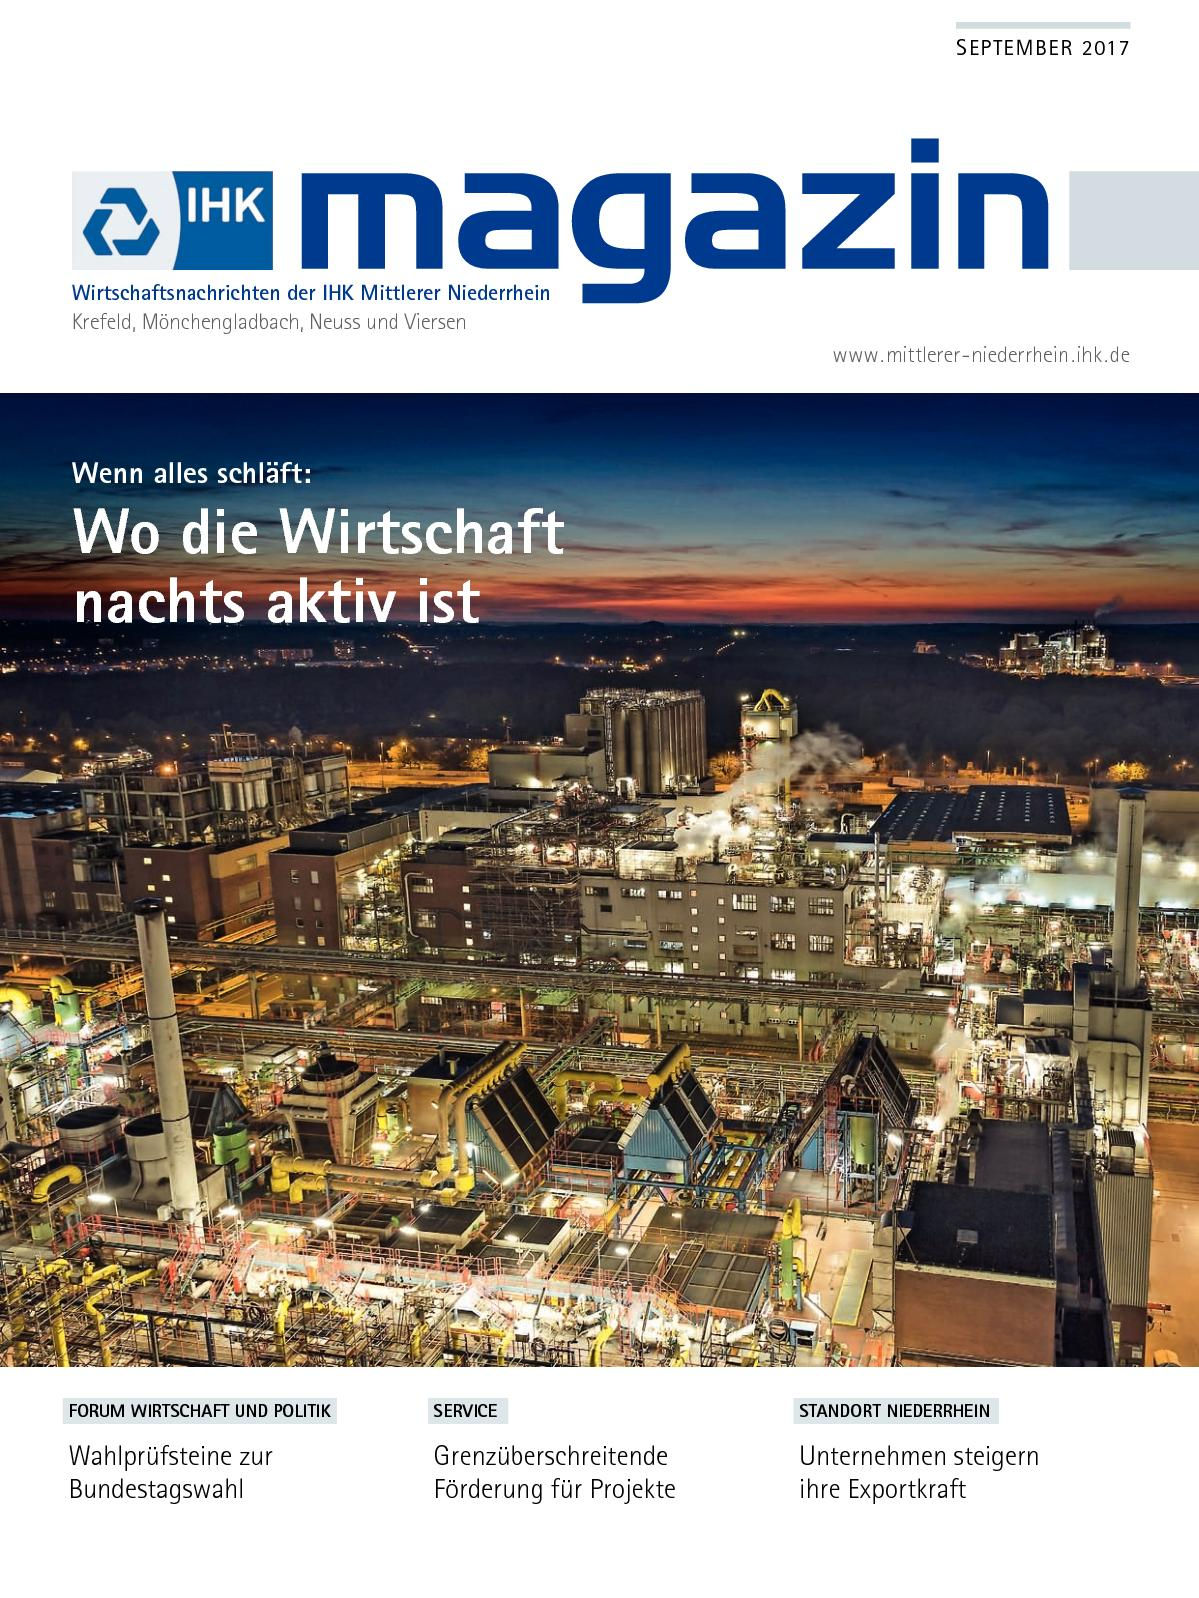 Calaméo - IHK Magazin September 2017